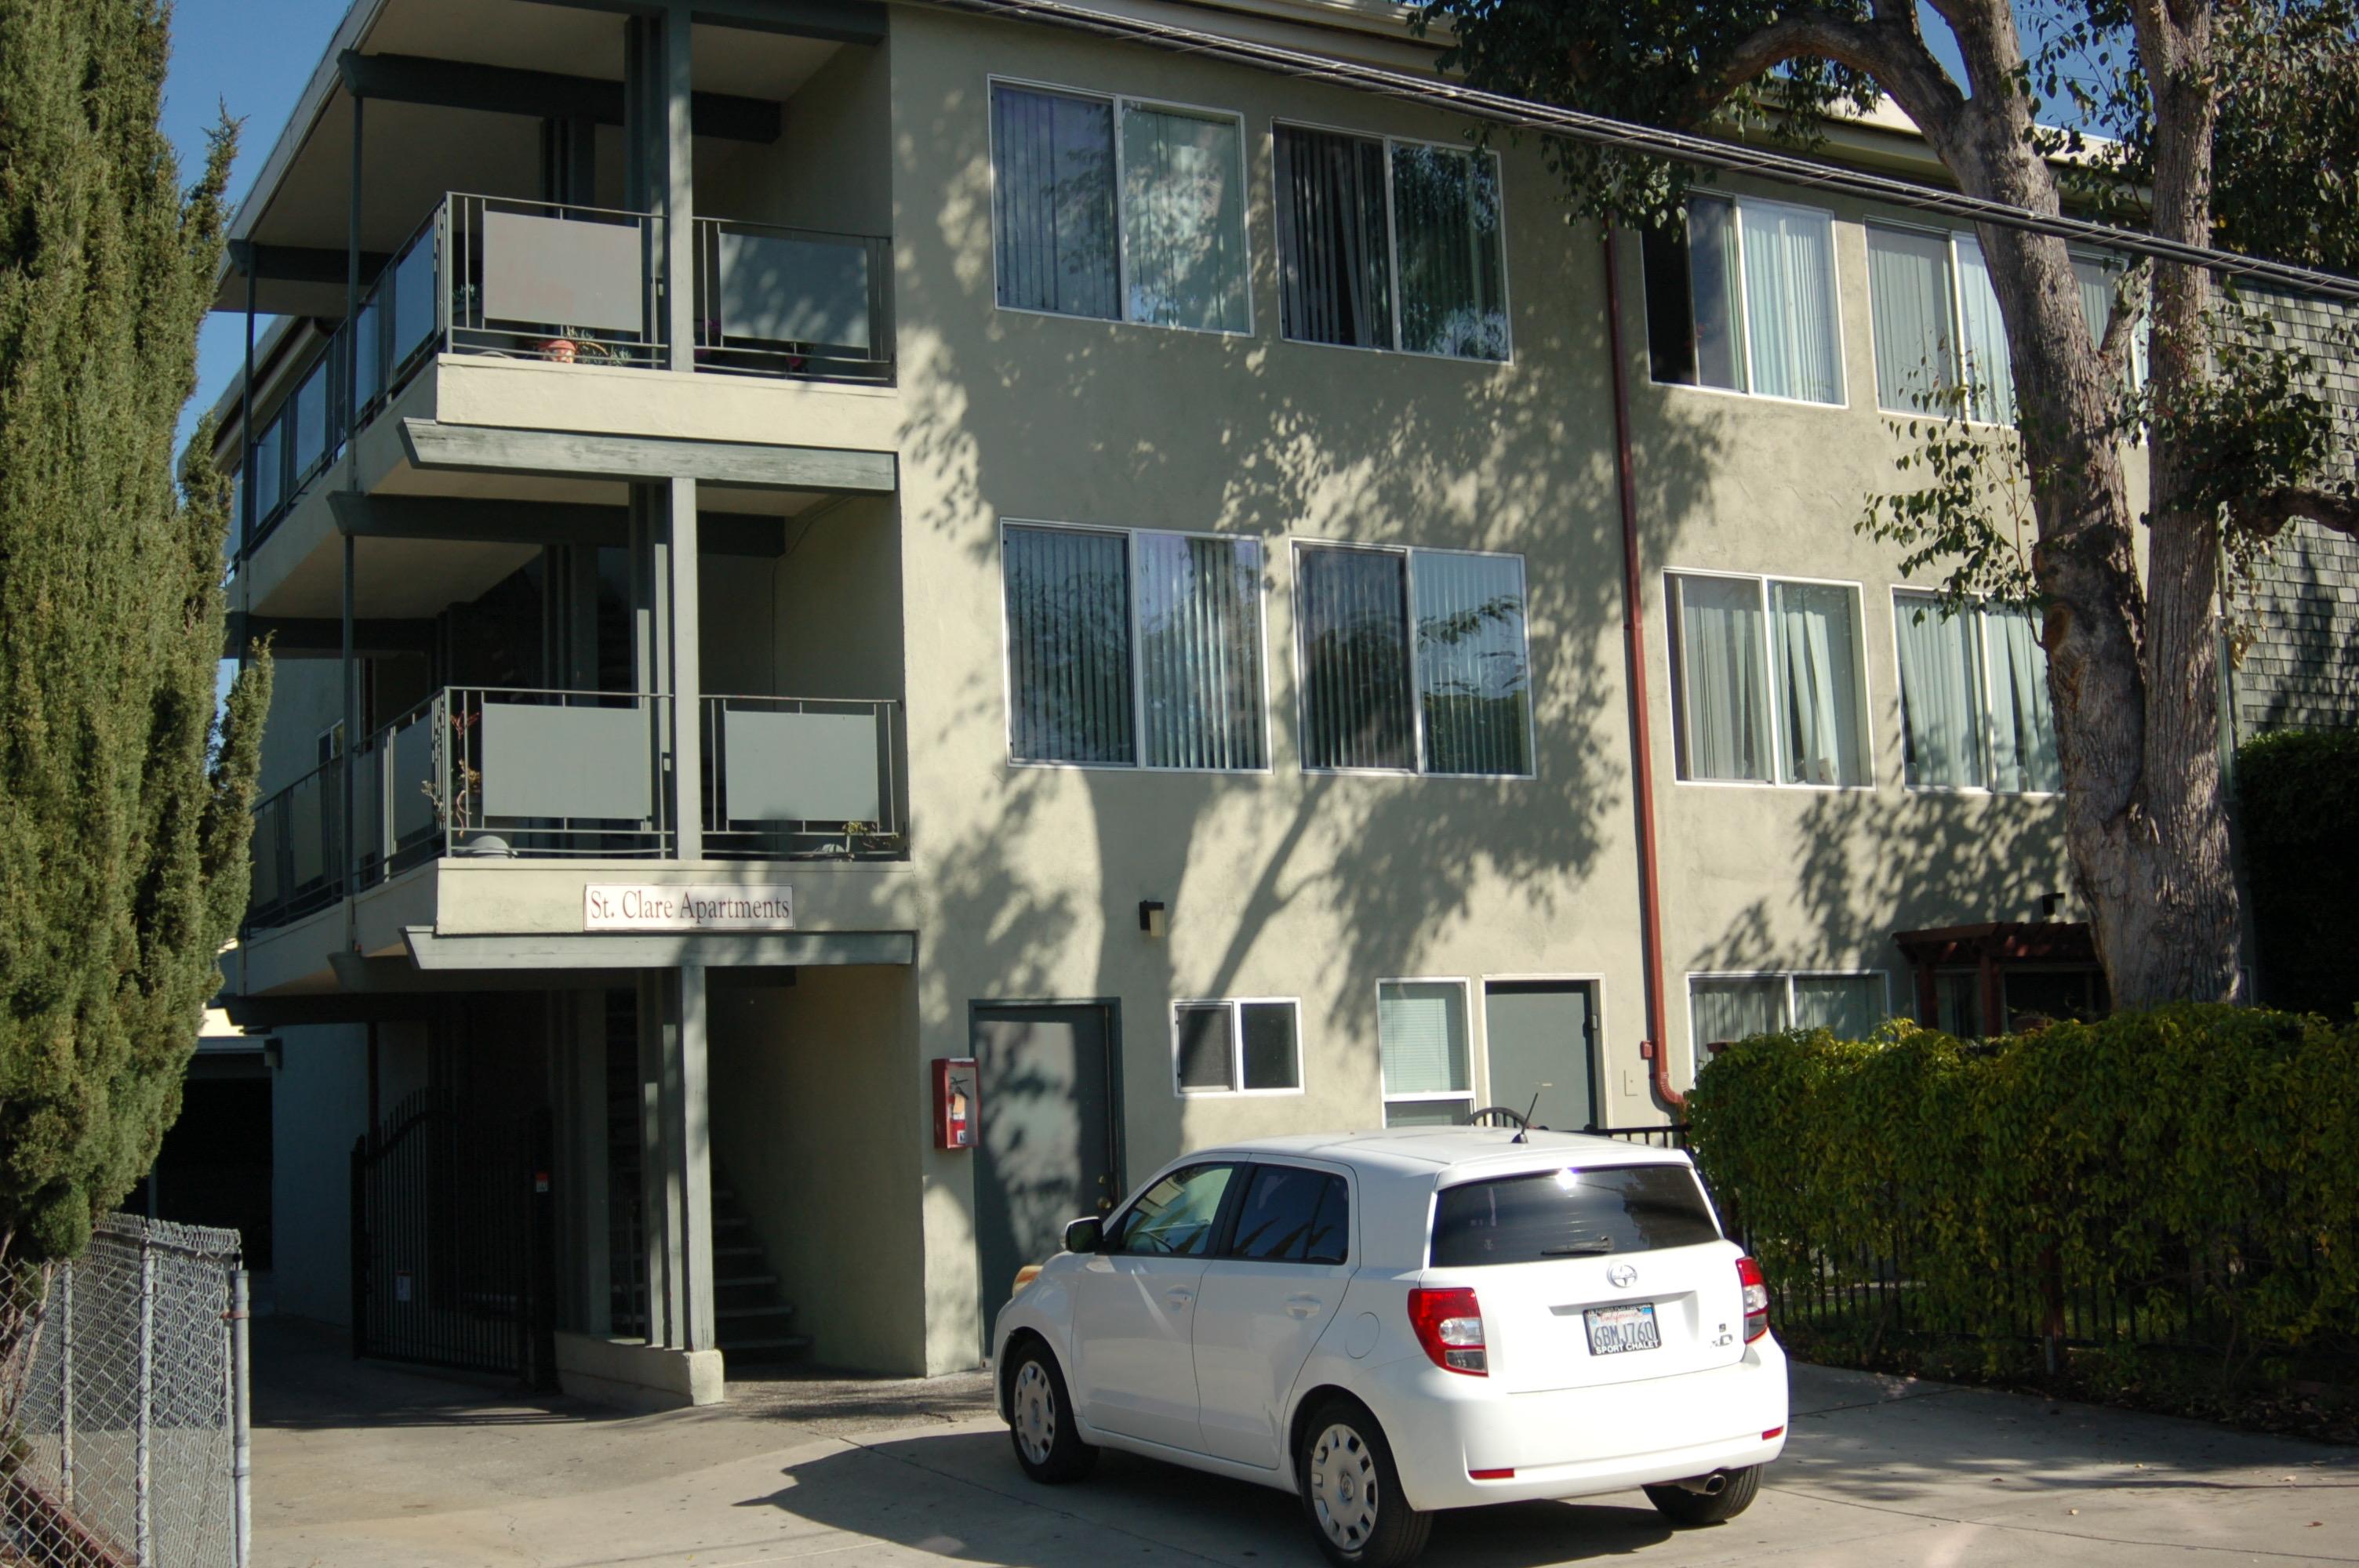 st-clares-apartments-st-francis-center